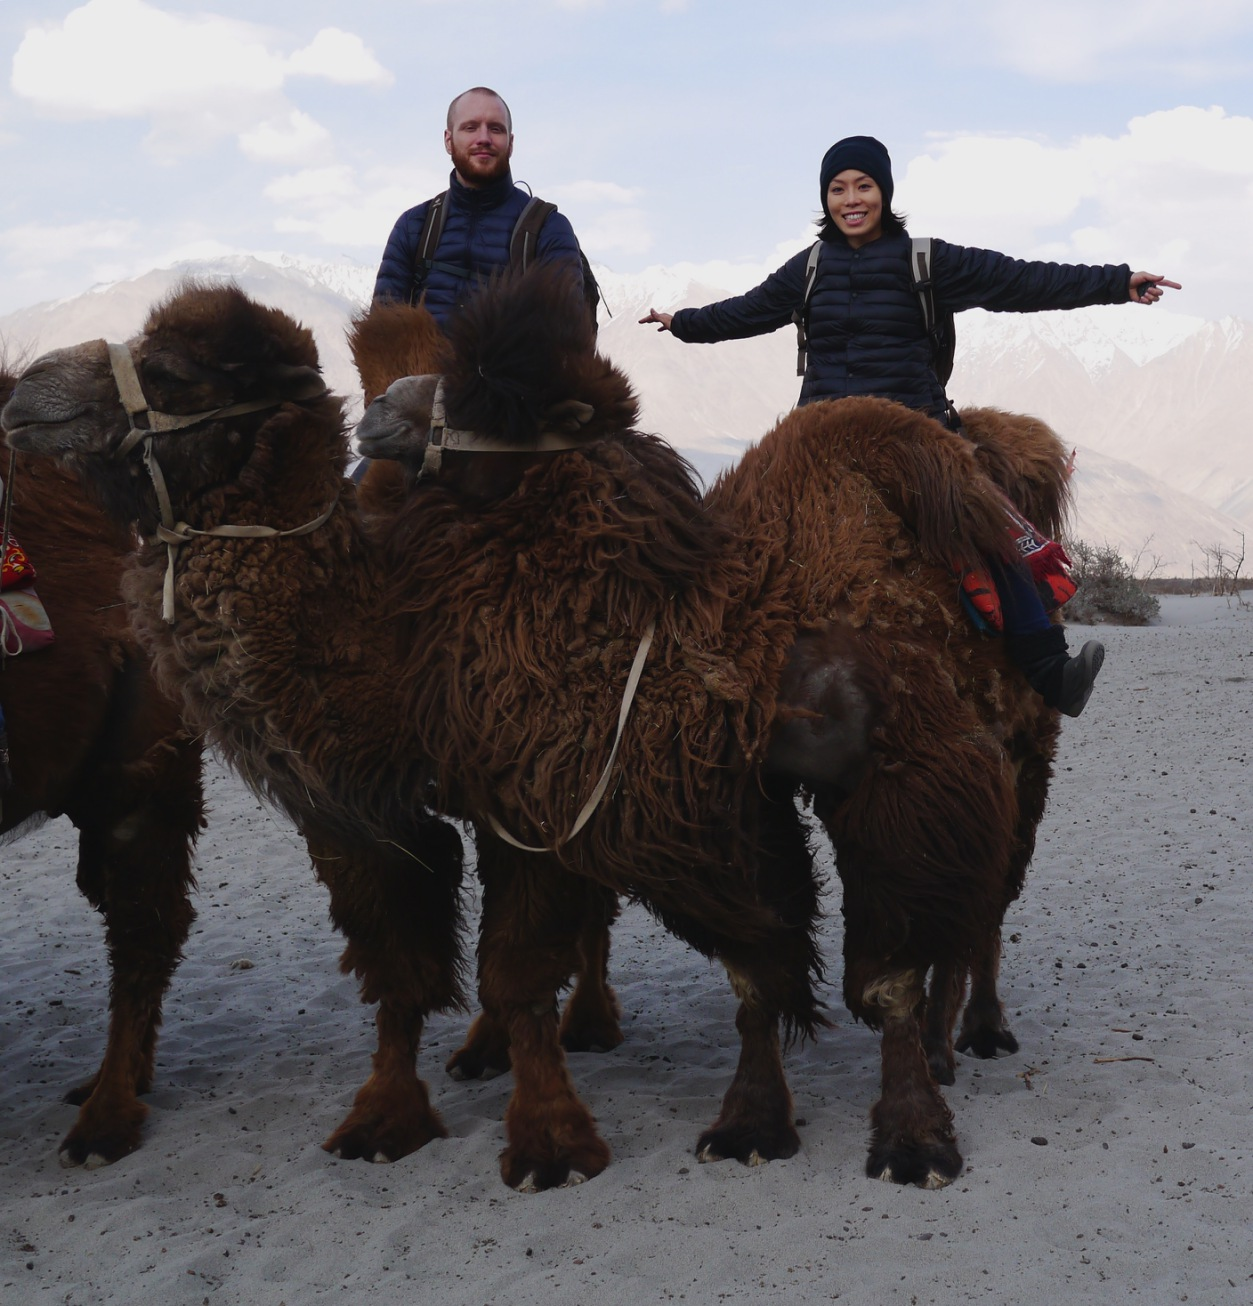 pud-and-karsten-on-bactrian-camels